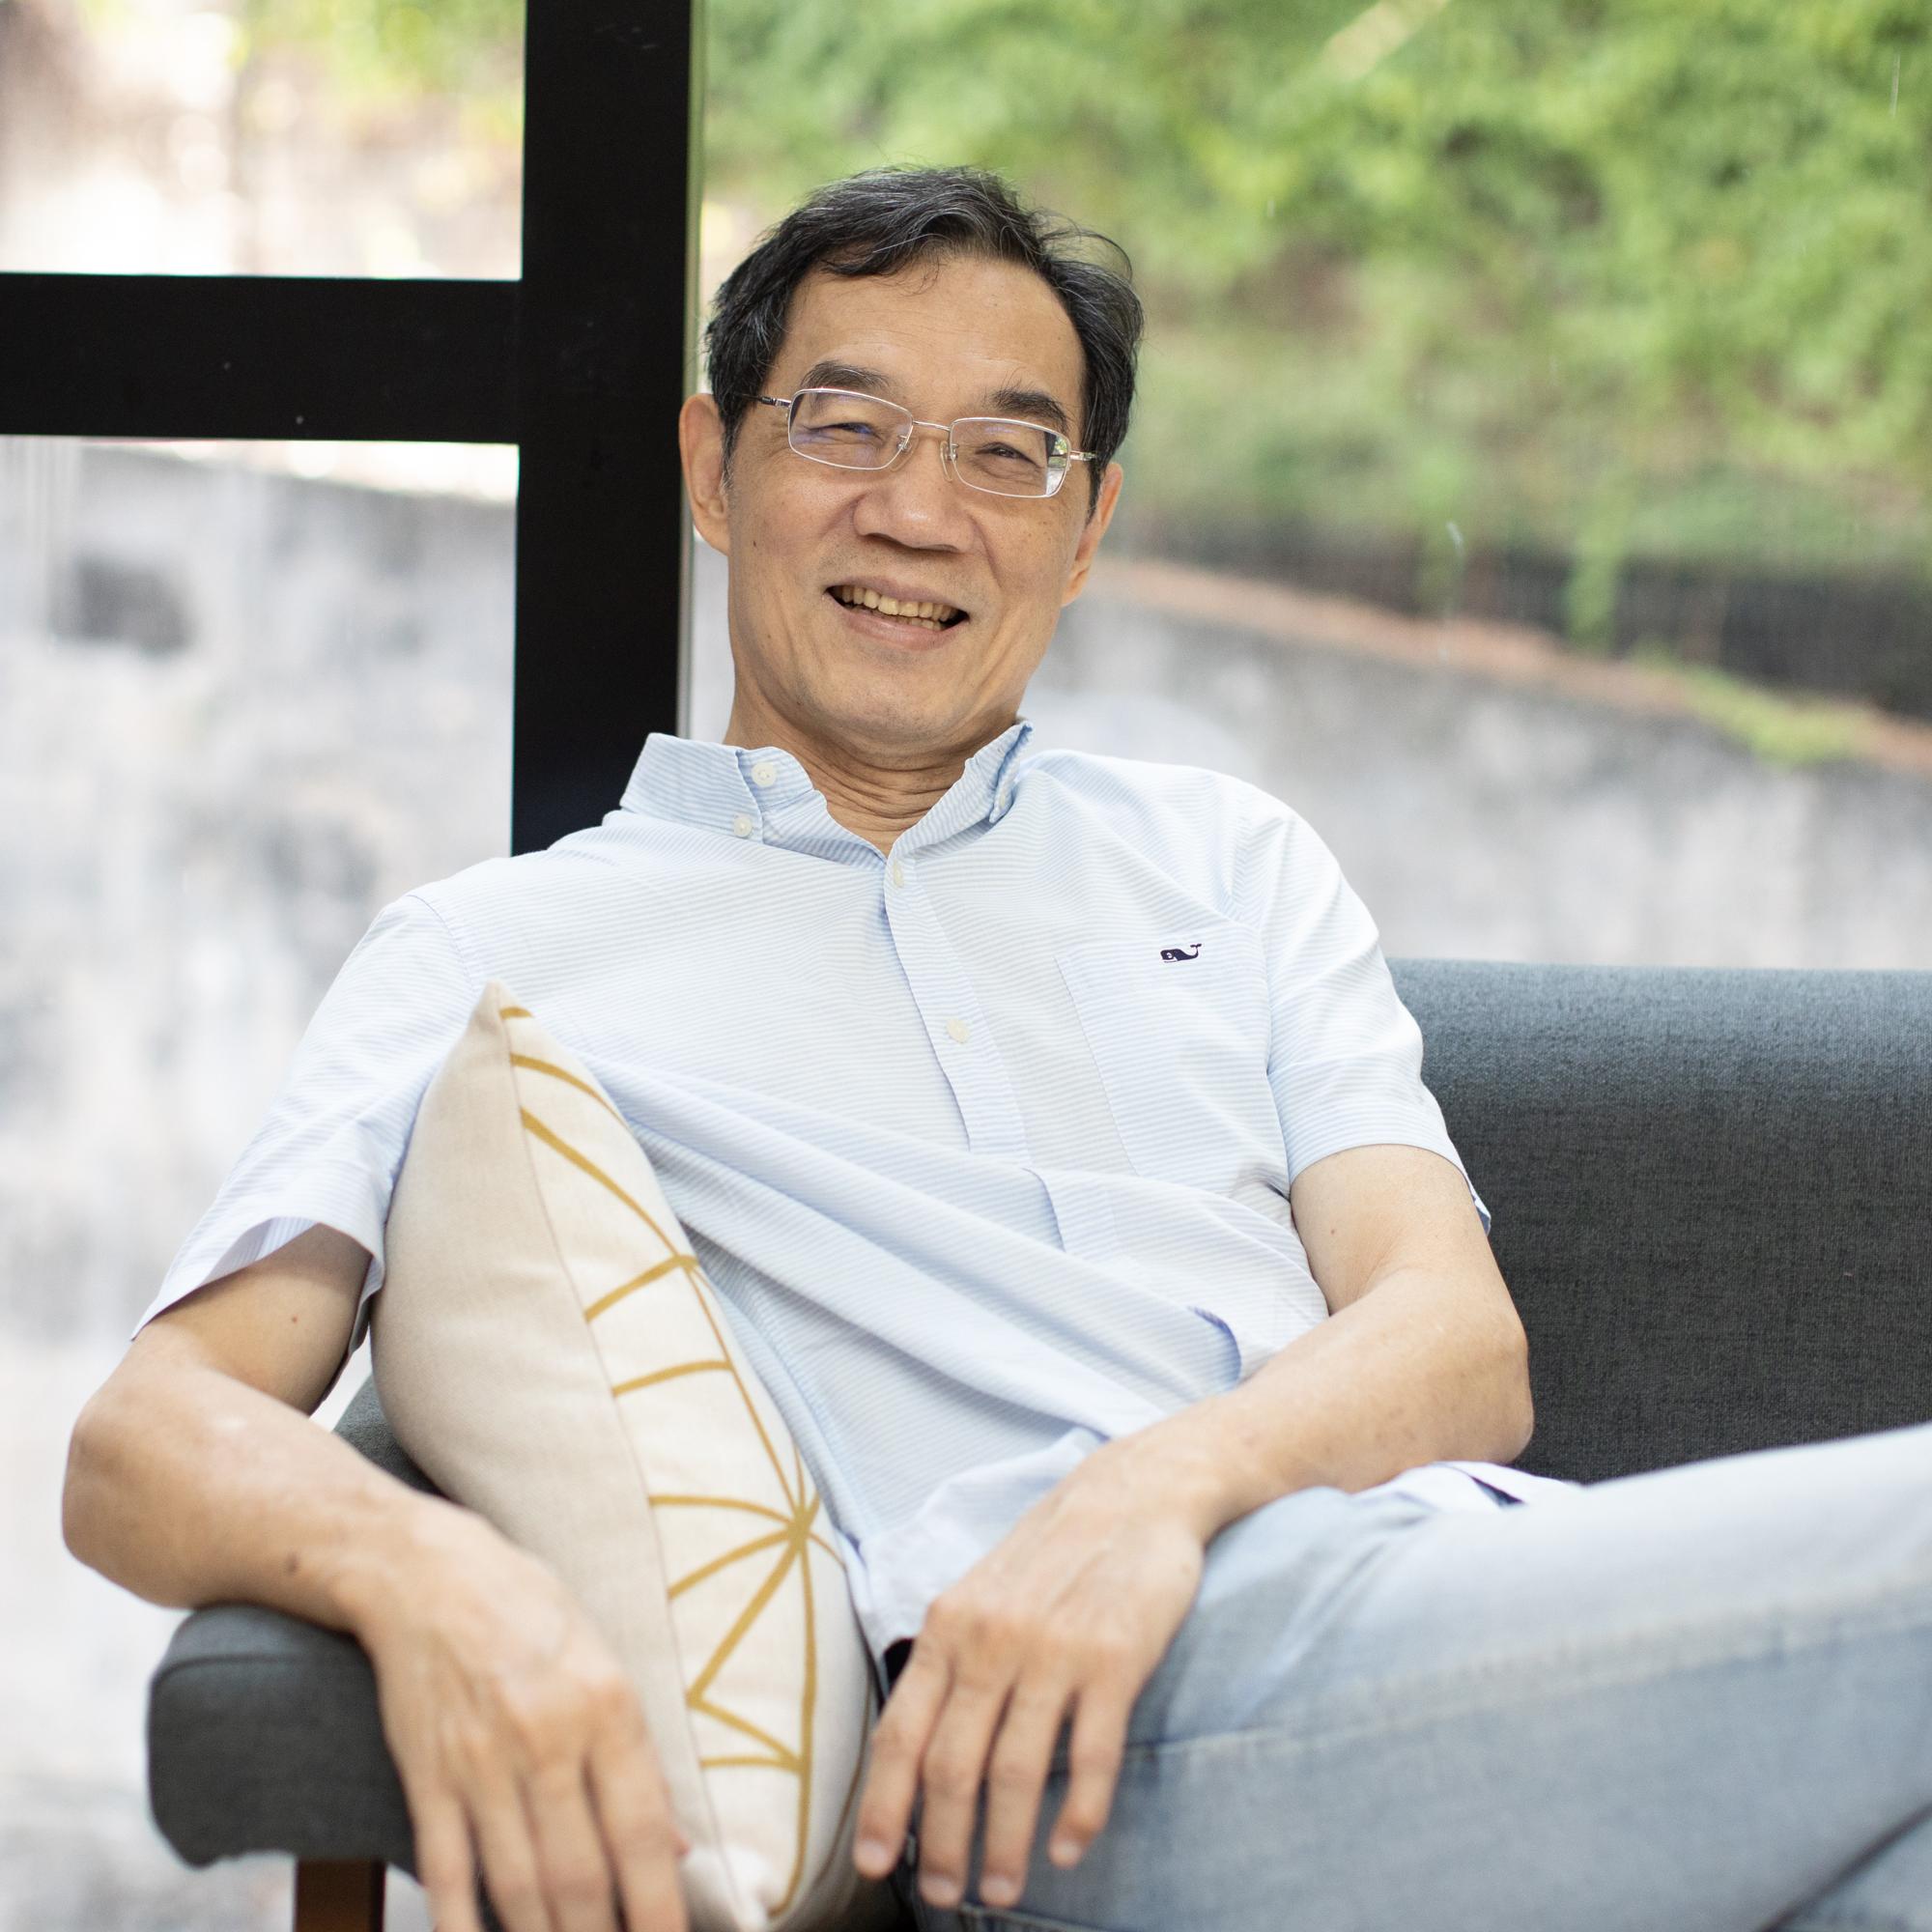 Han Shih Lee